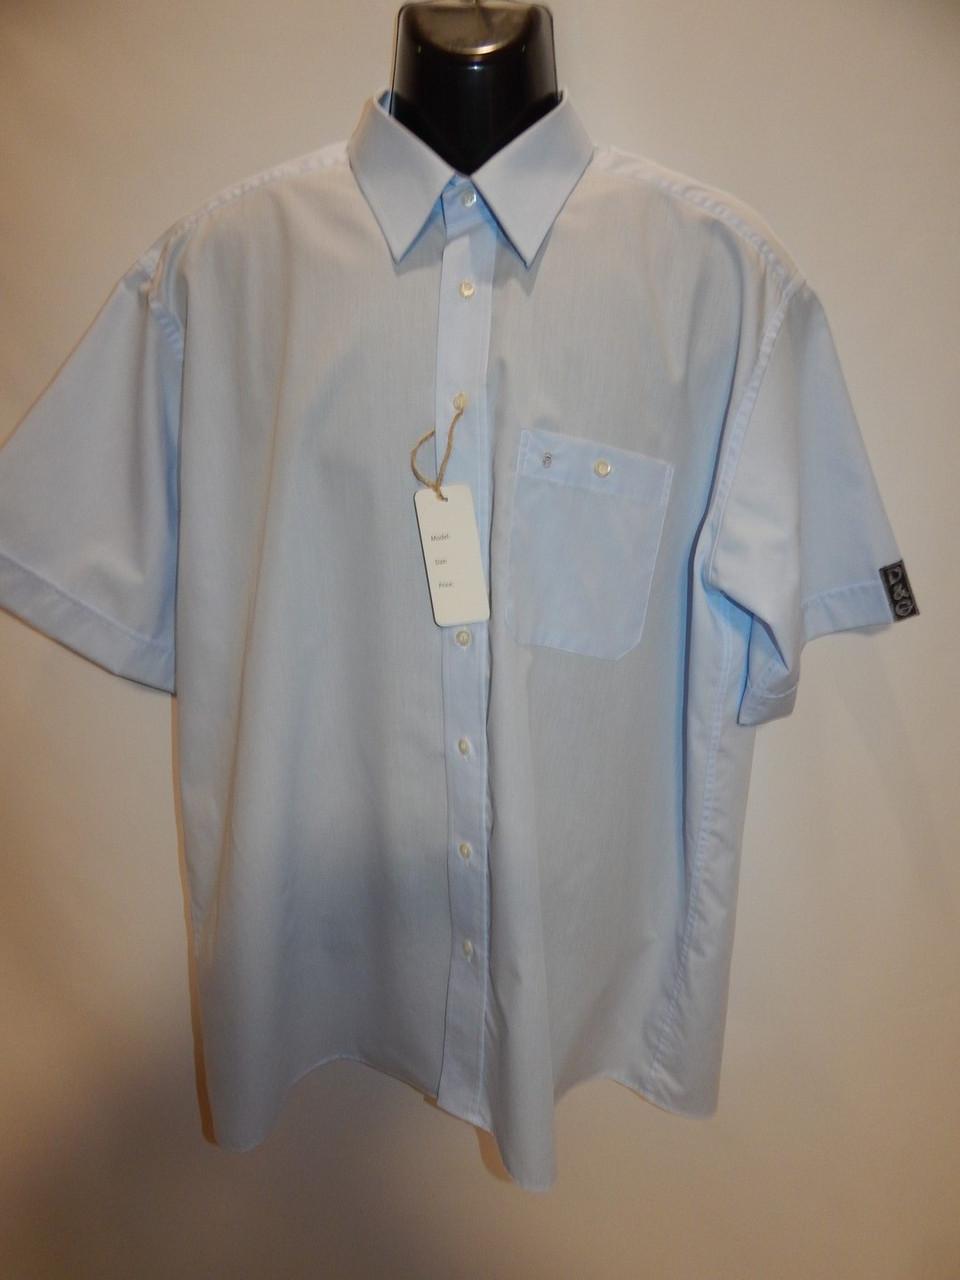 23c8a032e20a908 Мужская рубашка с коротким рукавом Eterna (018КР) р.52 - Интернет-магазин